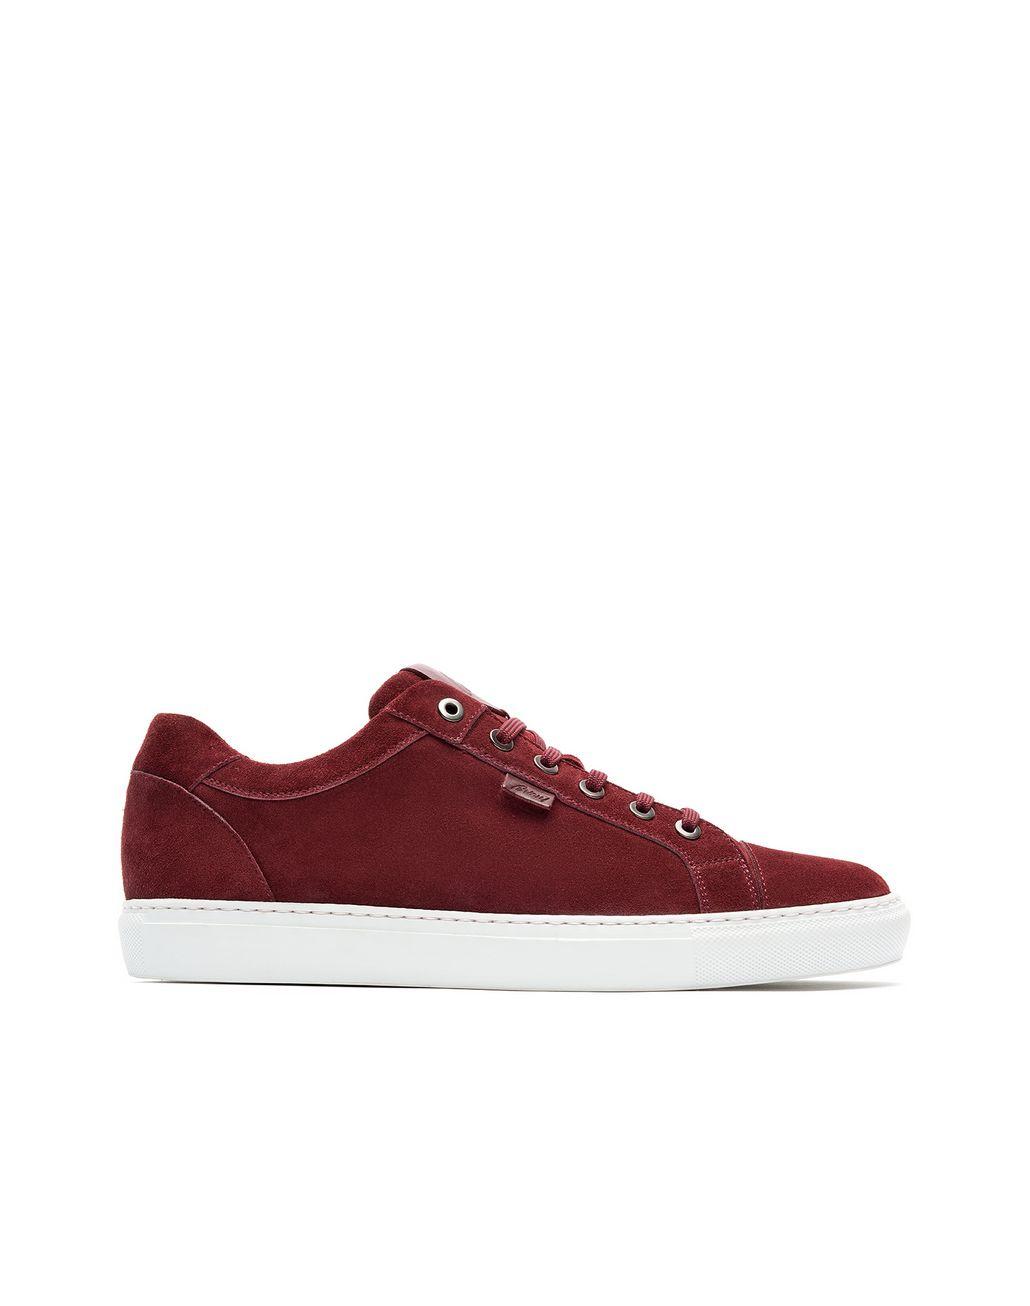 BRIONI Bordeaux Calfskin Suede Sneaker Sneakers [*** pickupInStoreShippingNotGuaranteed_info ***] f